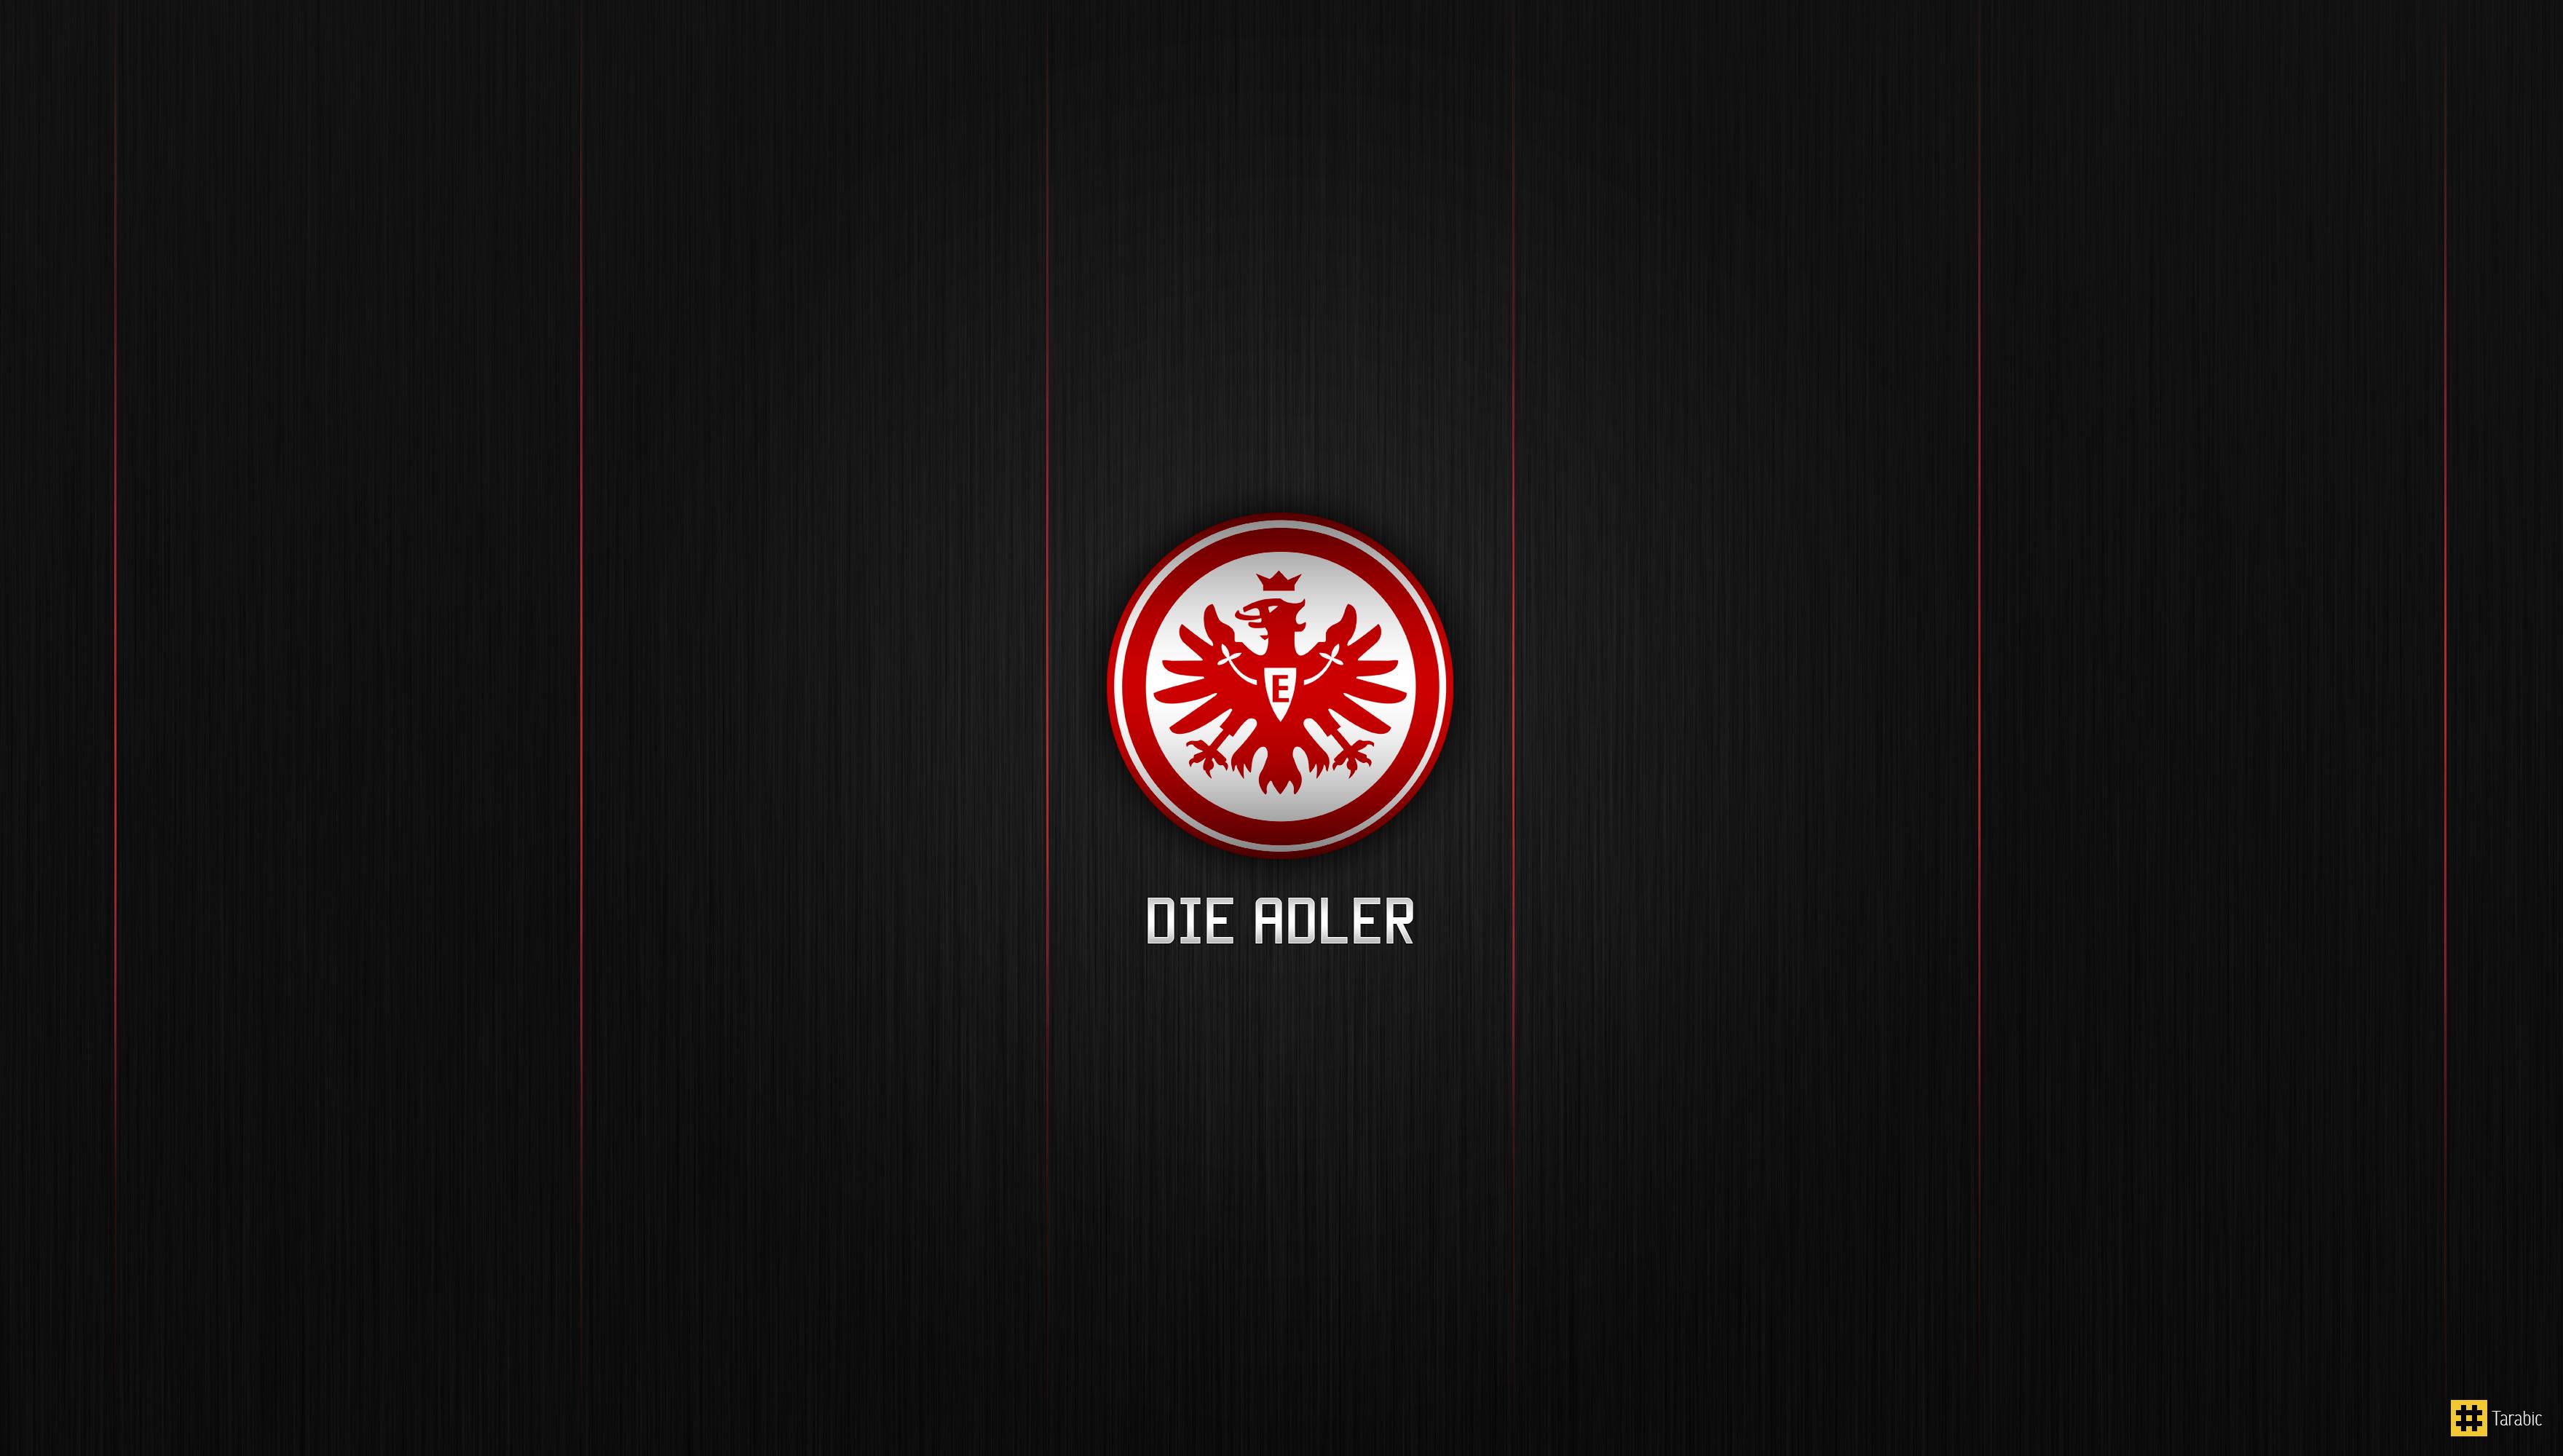 Eintracht Frankfurt Wallpaper Hd